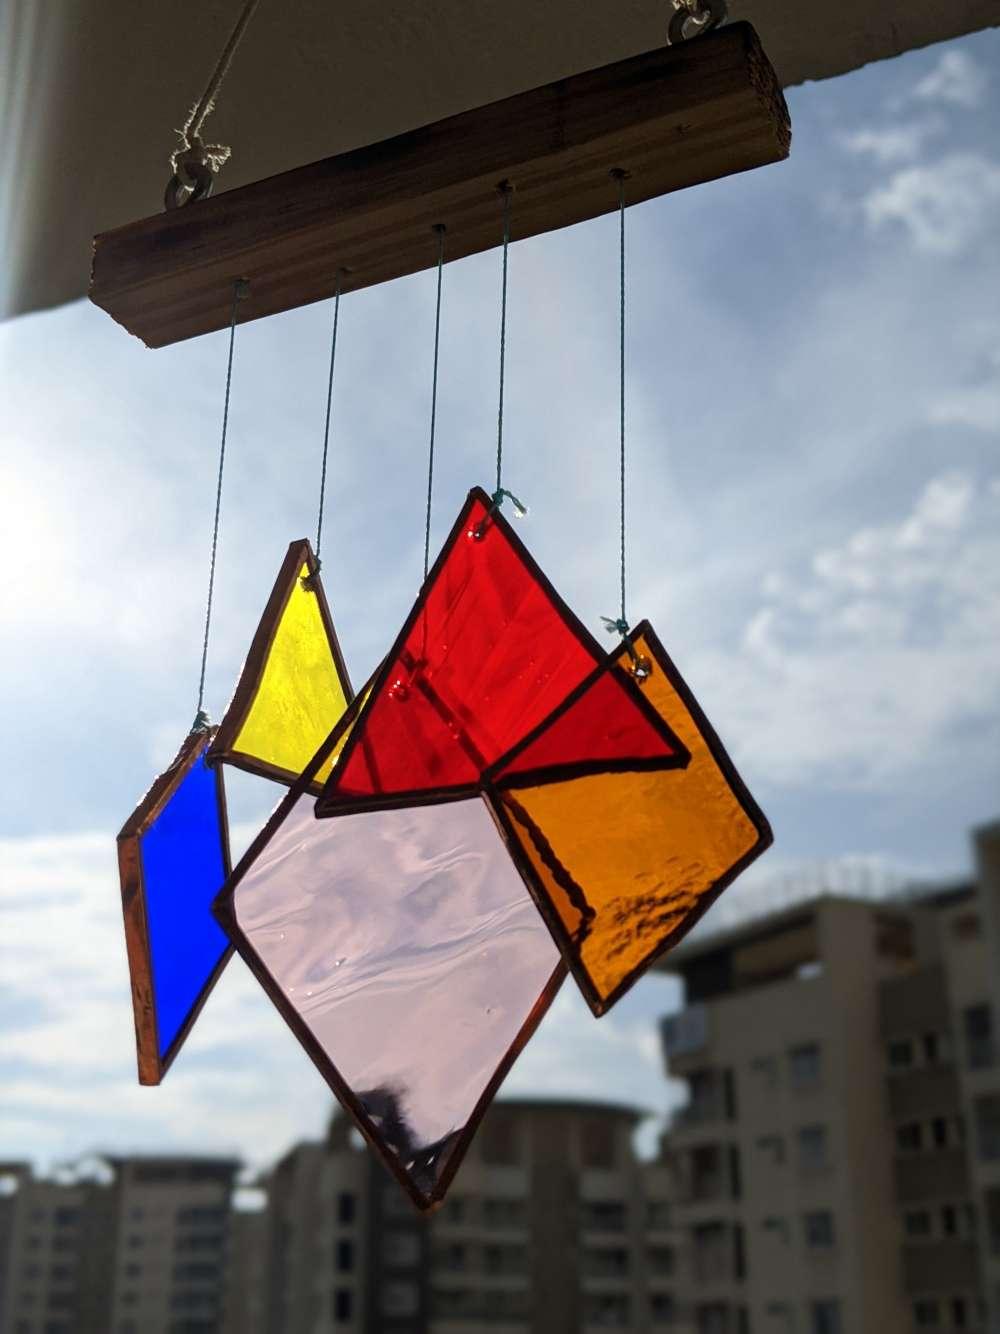 Mini rainbow windchime hanging